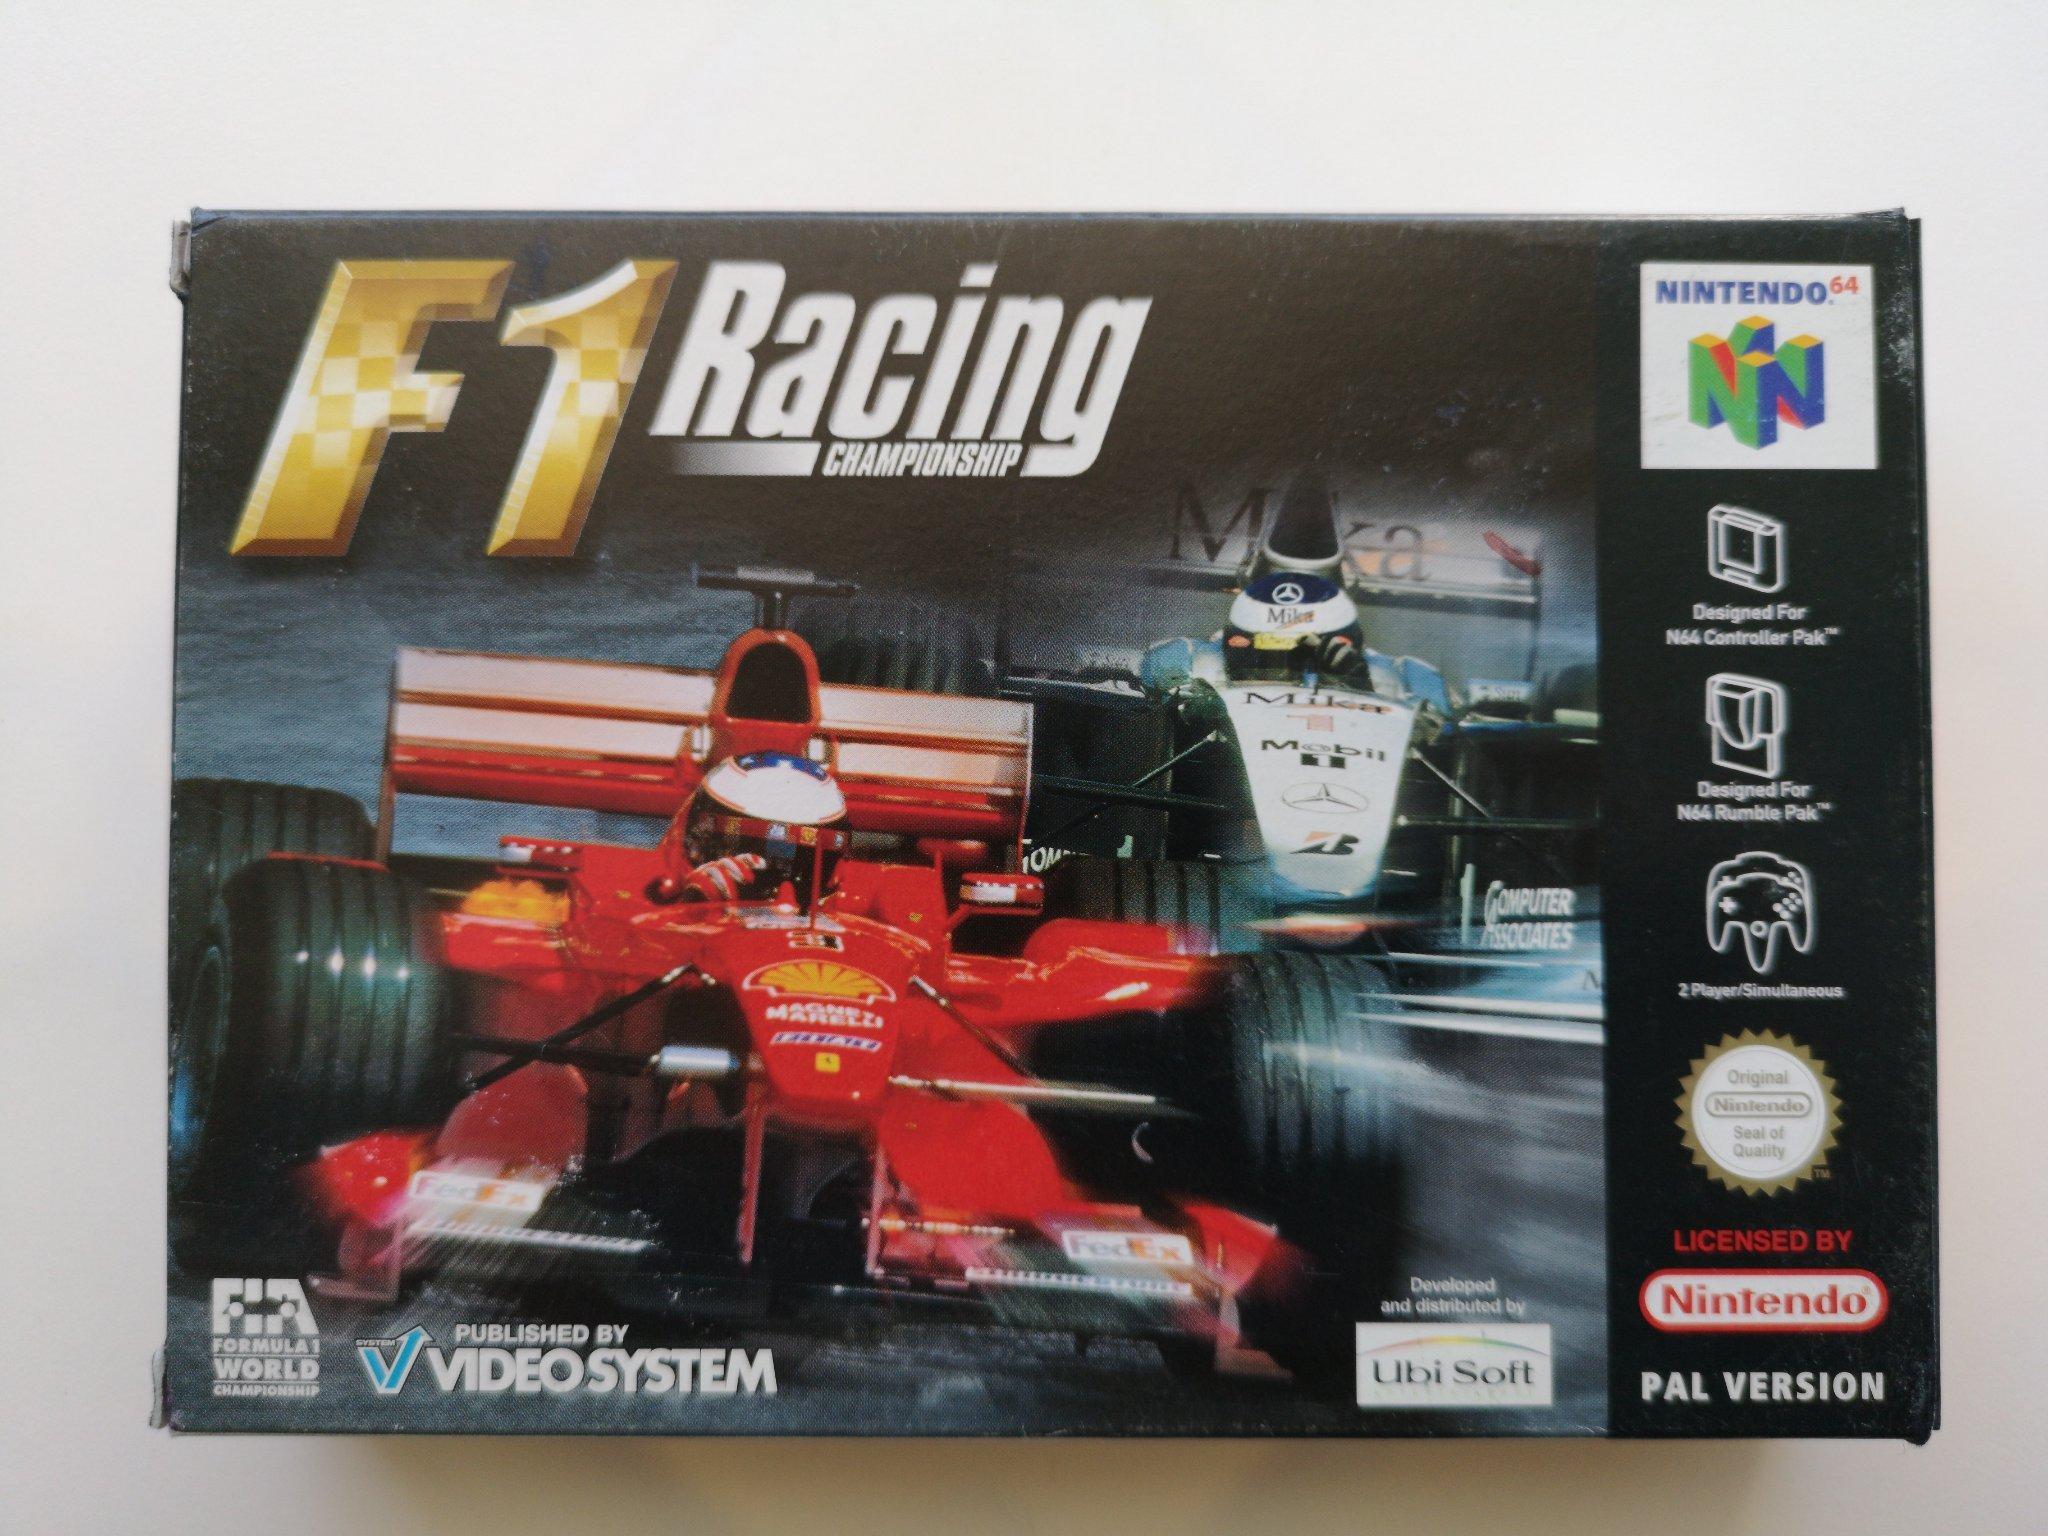 F1 Racing Championship Till N64 Komplett I Fin 413272804 ᐈ Kop Pa Tradera